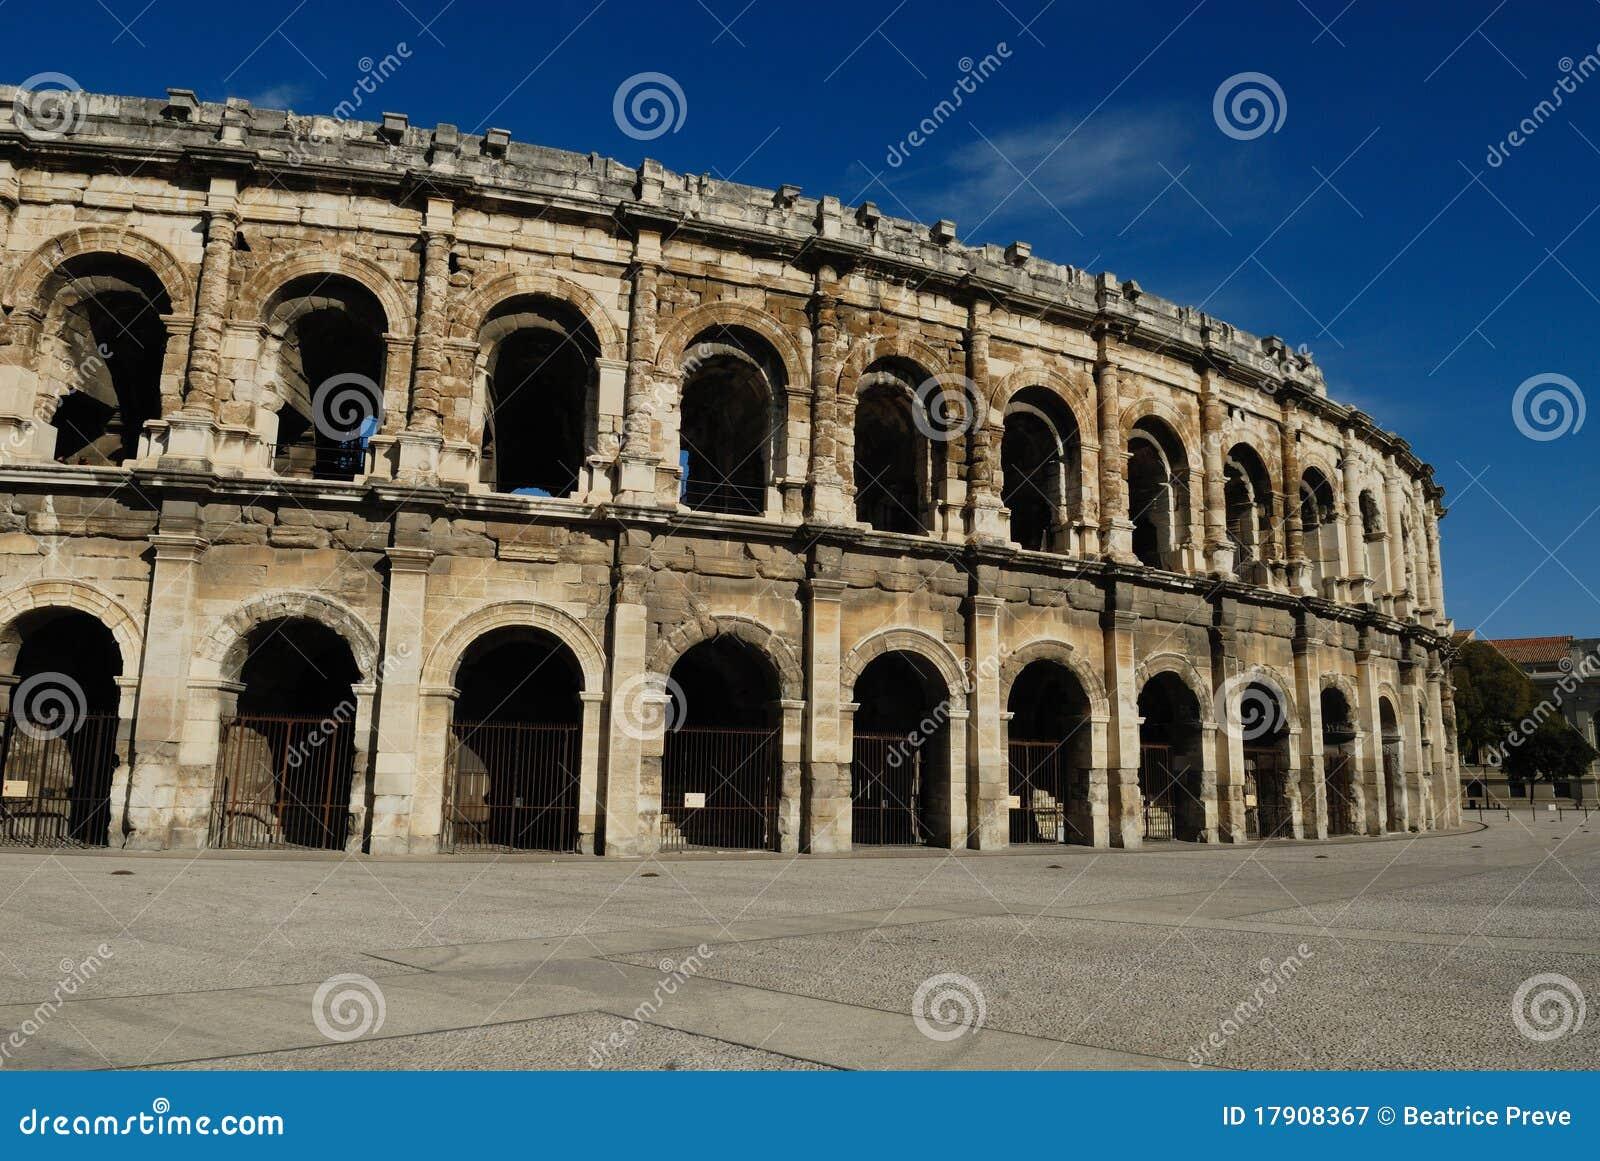 Arena romana em Nimes France